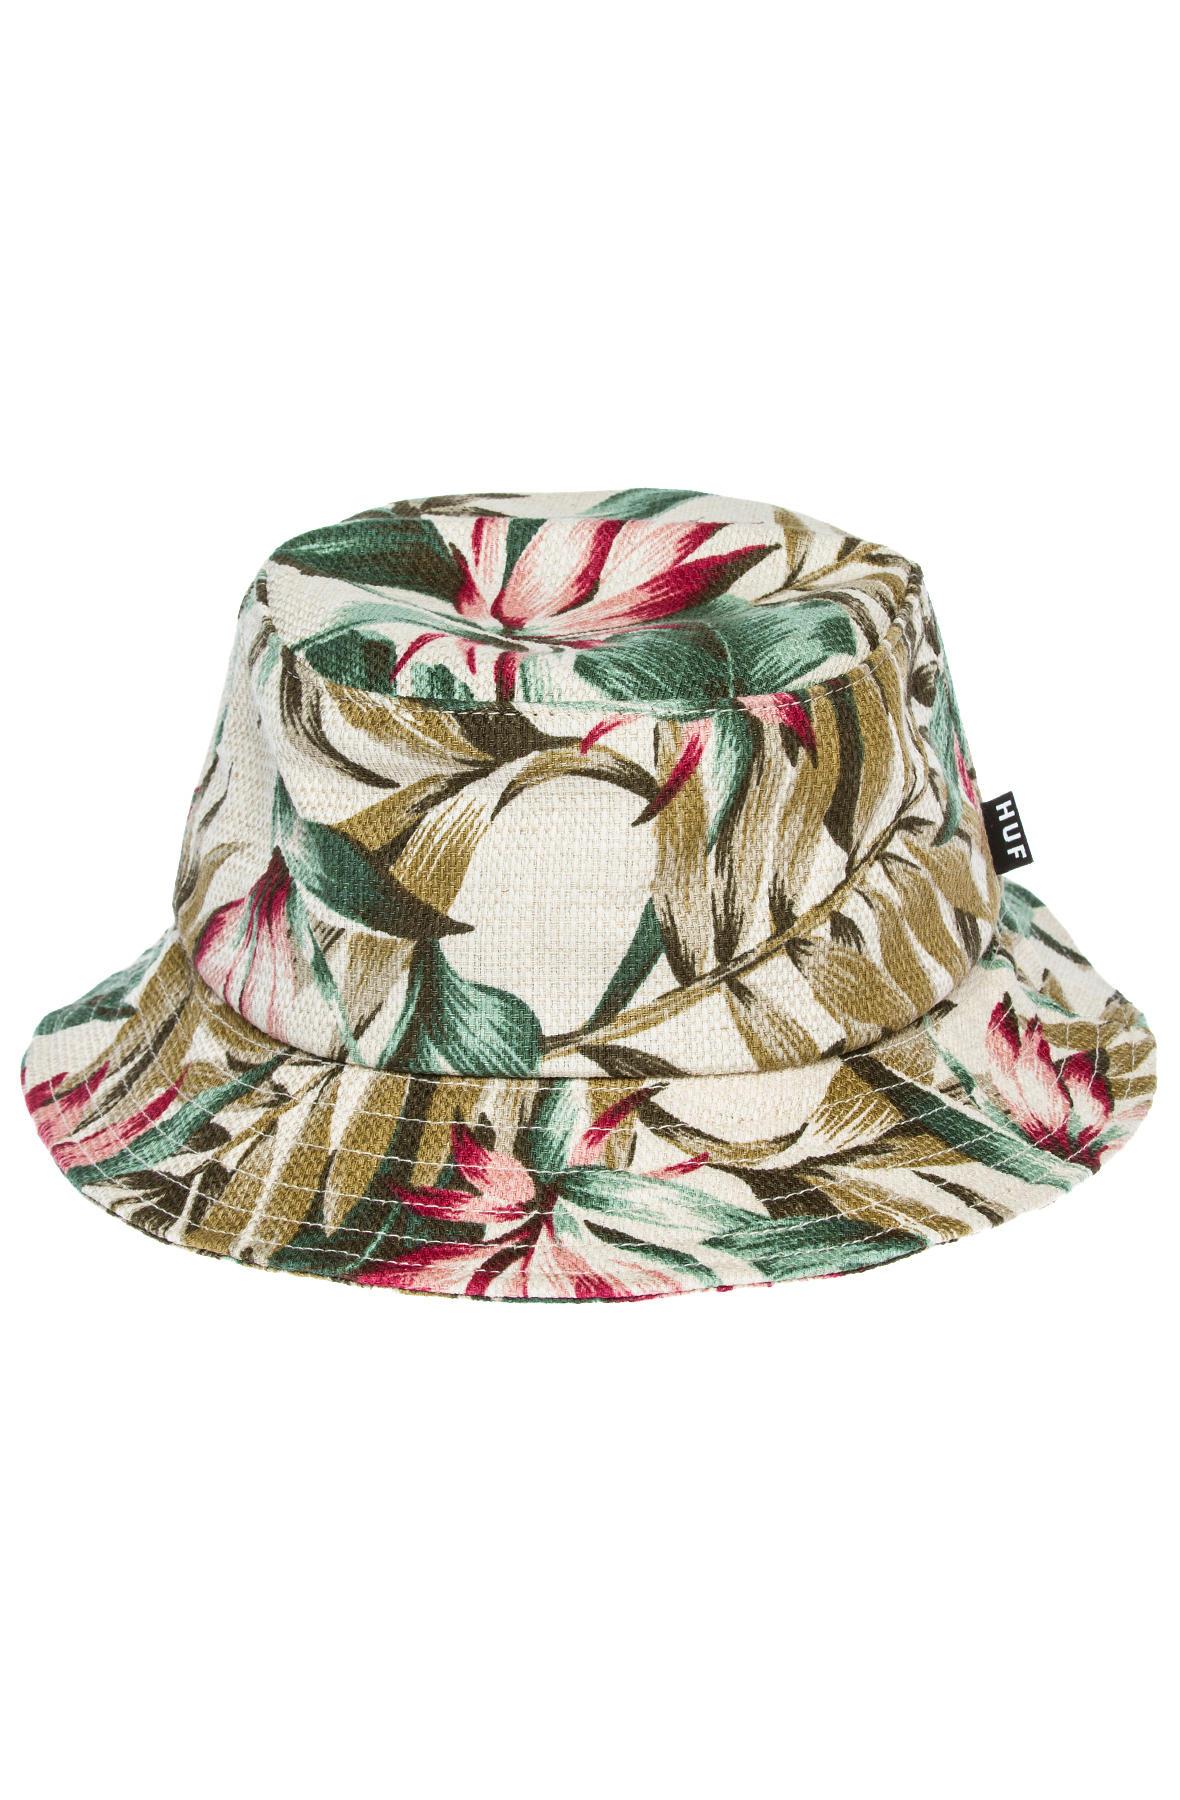 4a4adb9269f Lyst - Huf The Waikiki Bucket Hat for Men